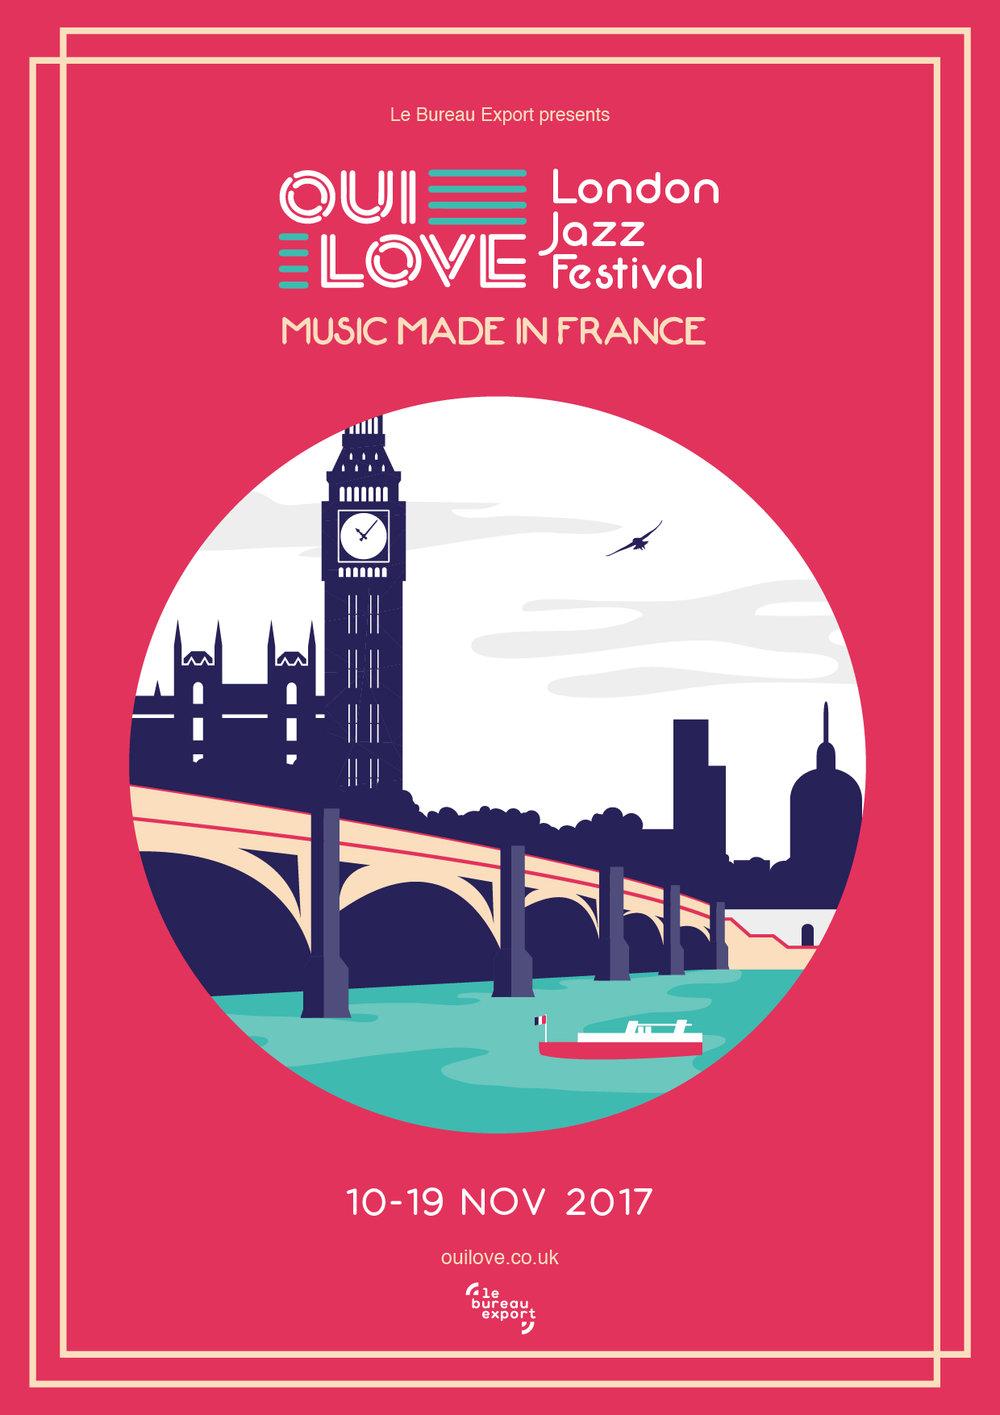 France at London Jazz Festival